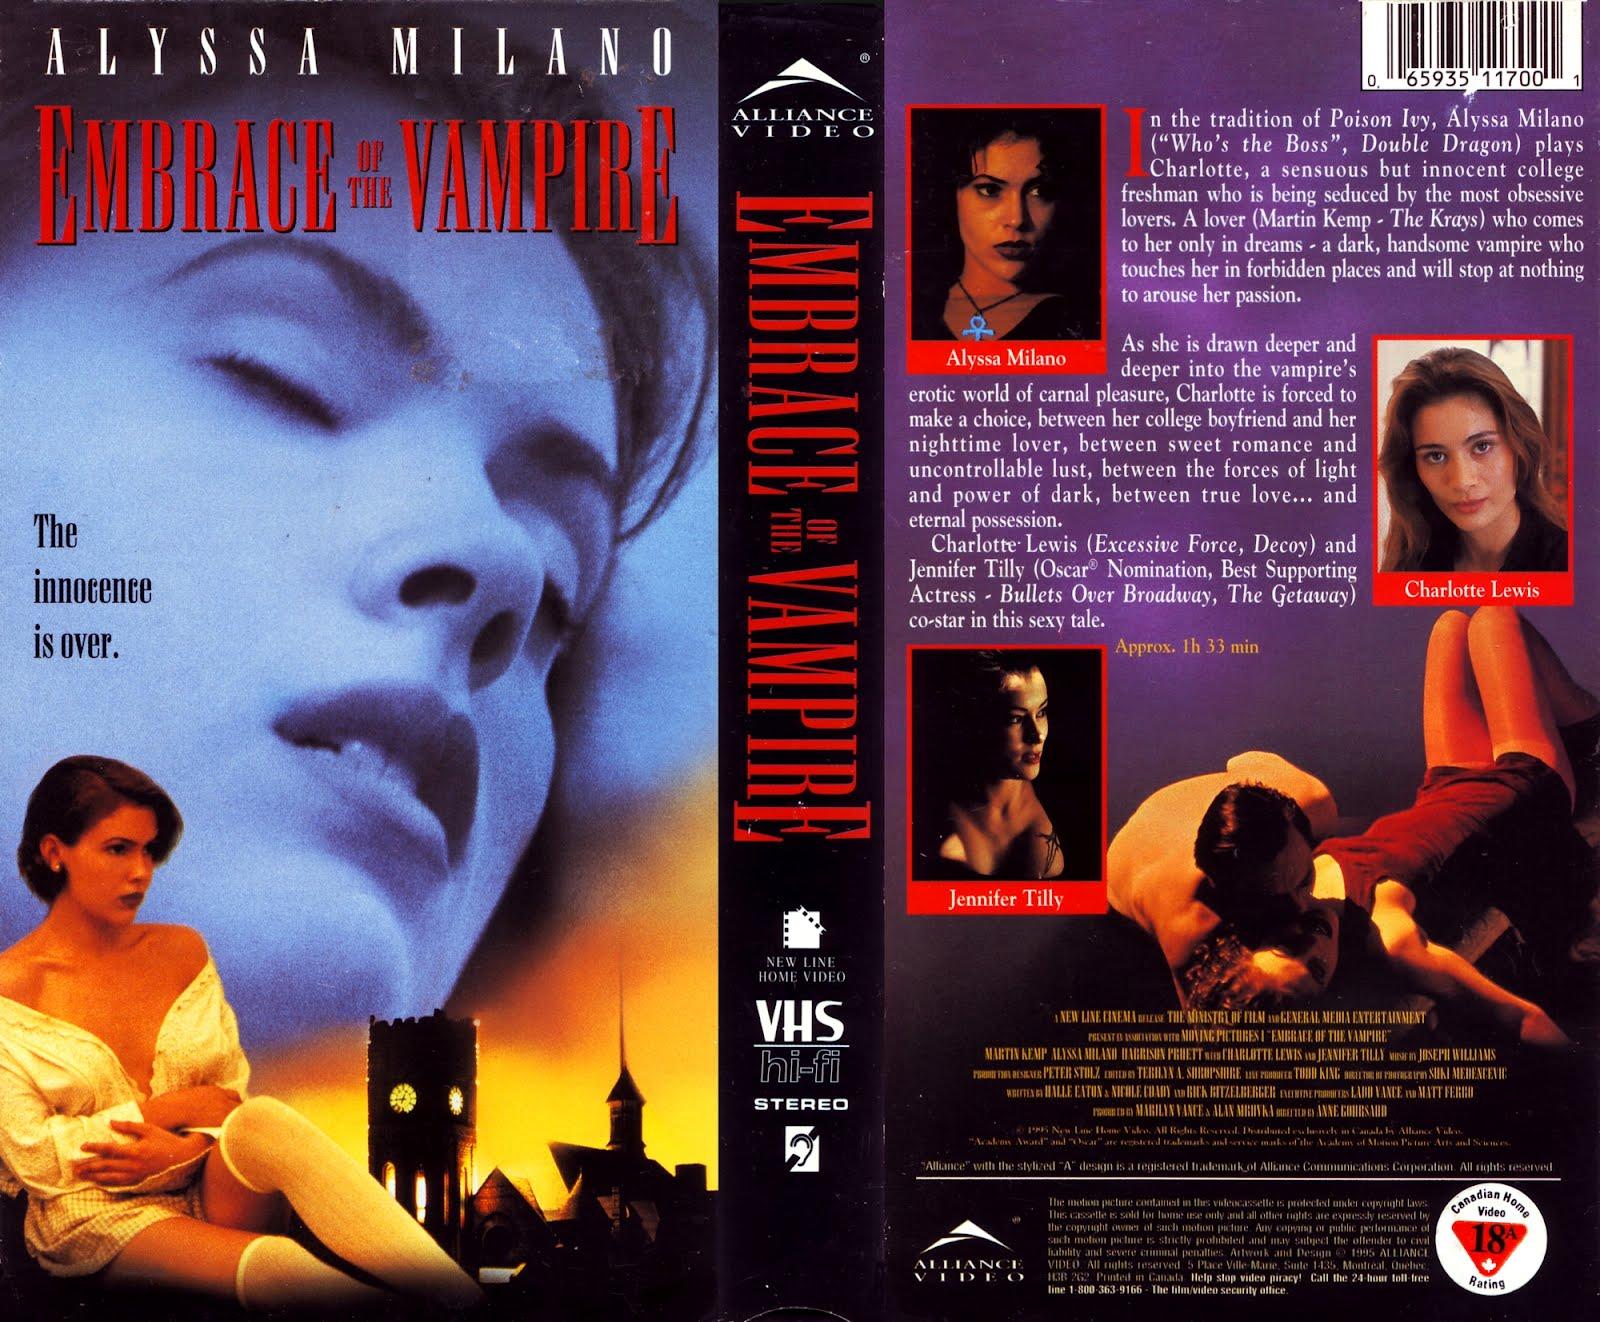 Alyssa Milano Embrace Of The Vampire vhs cover scans: embrace of the vampire (1995)